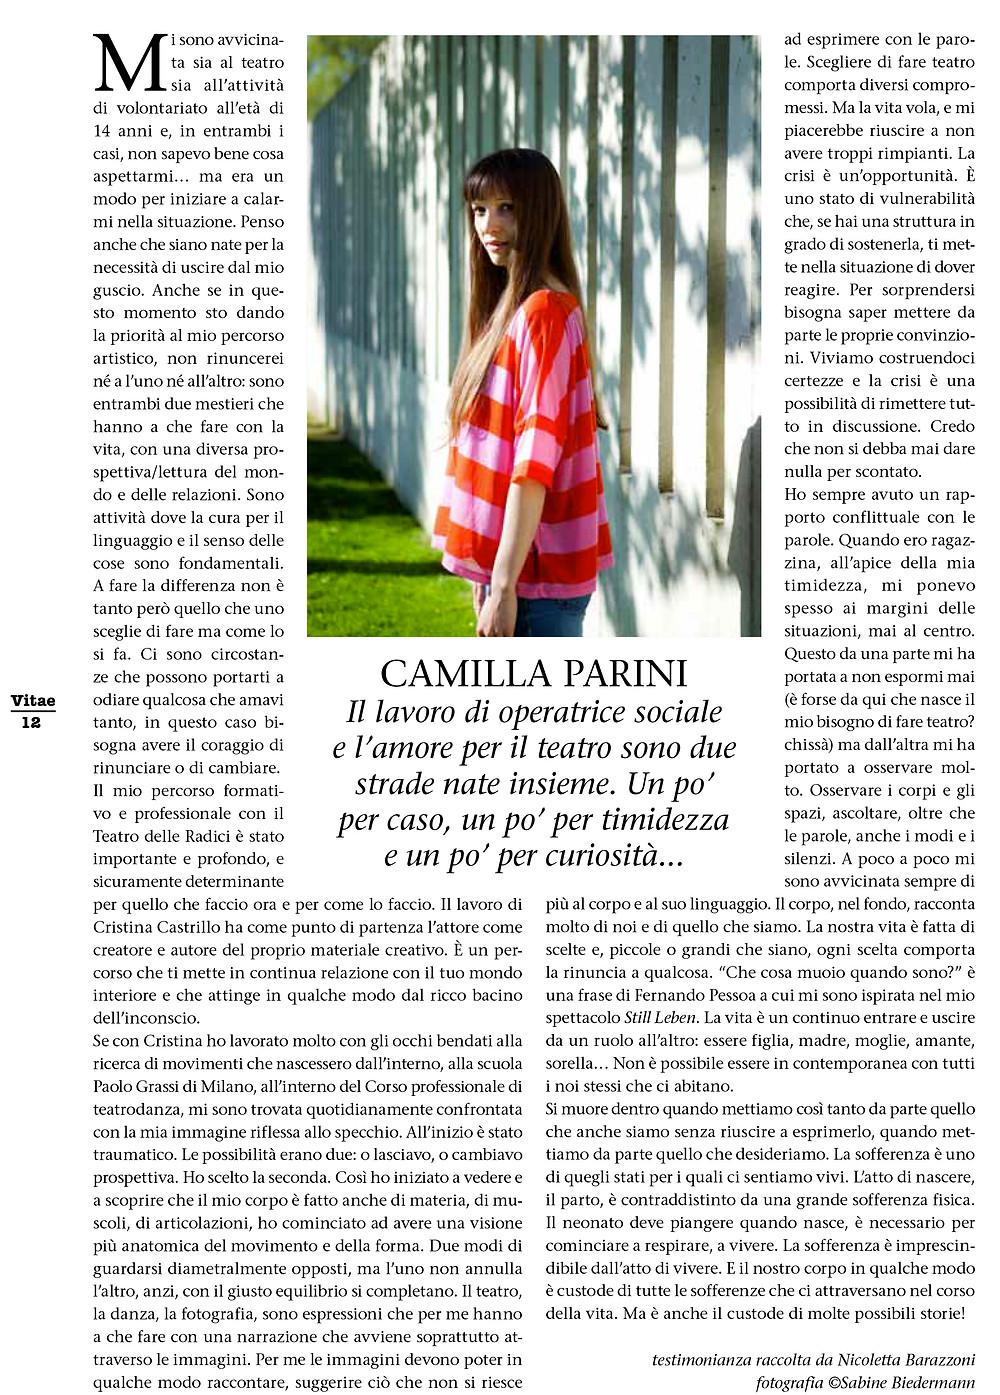 12_Vitae_Camilla Parini.jpg